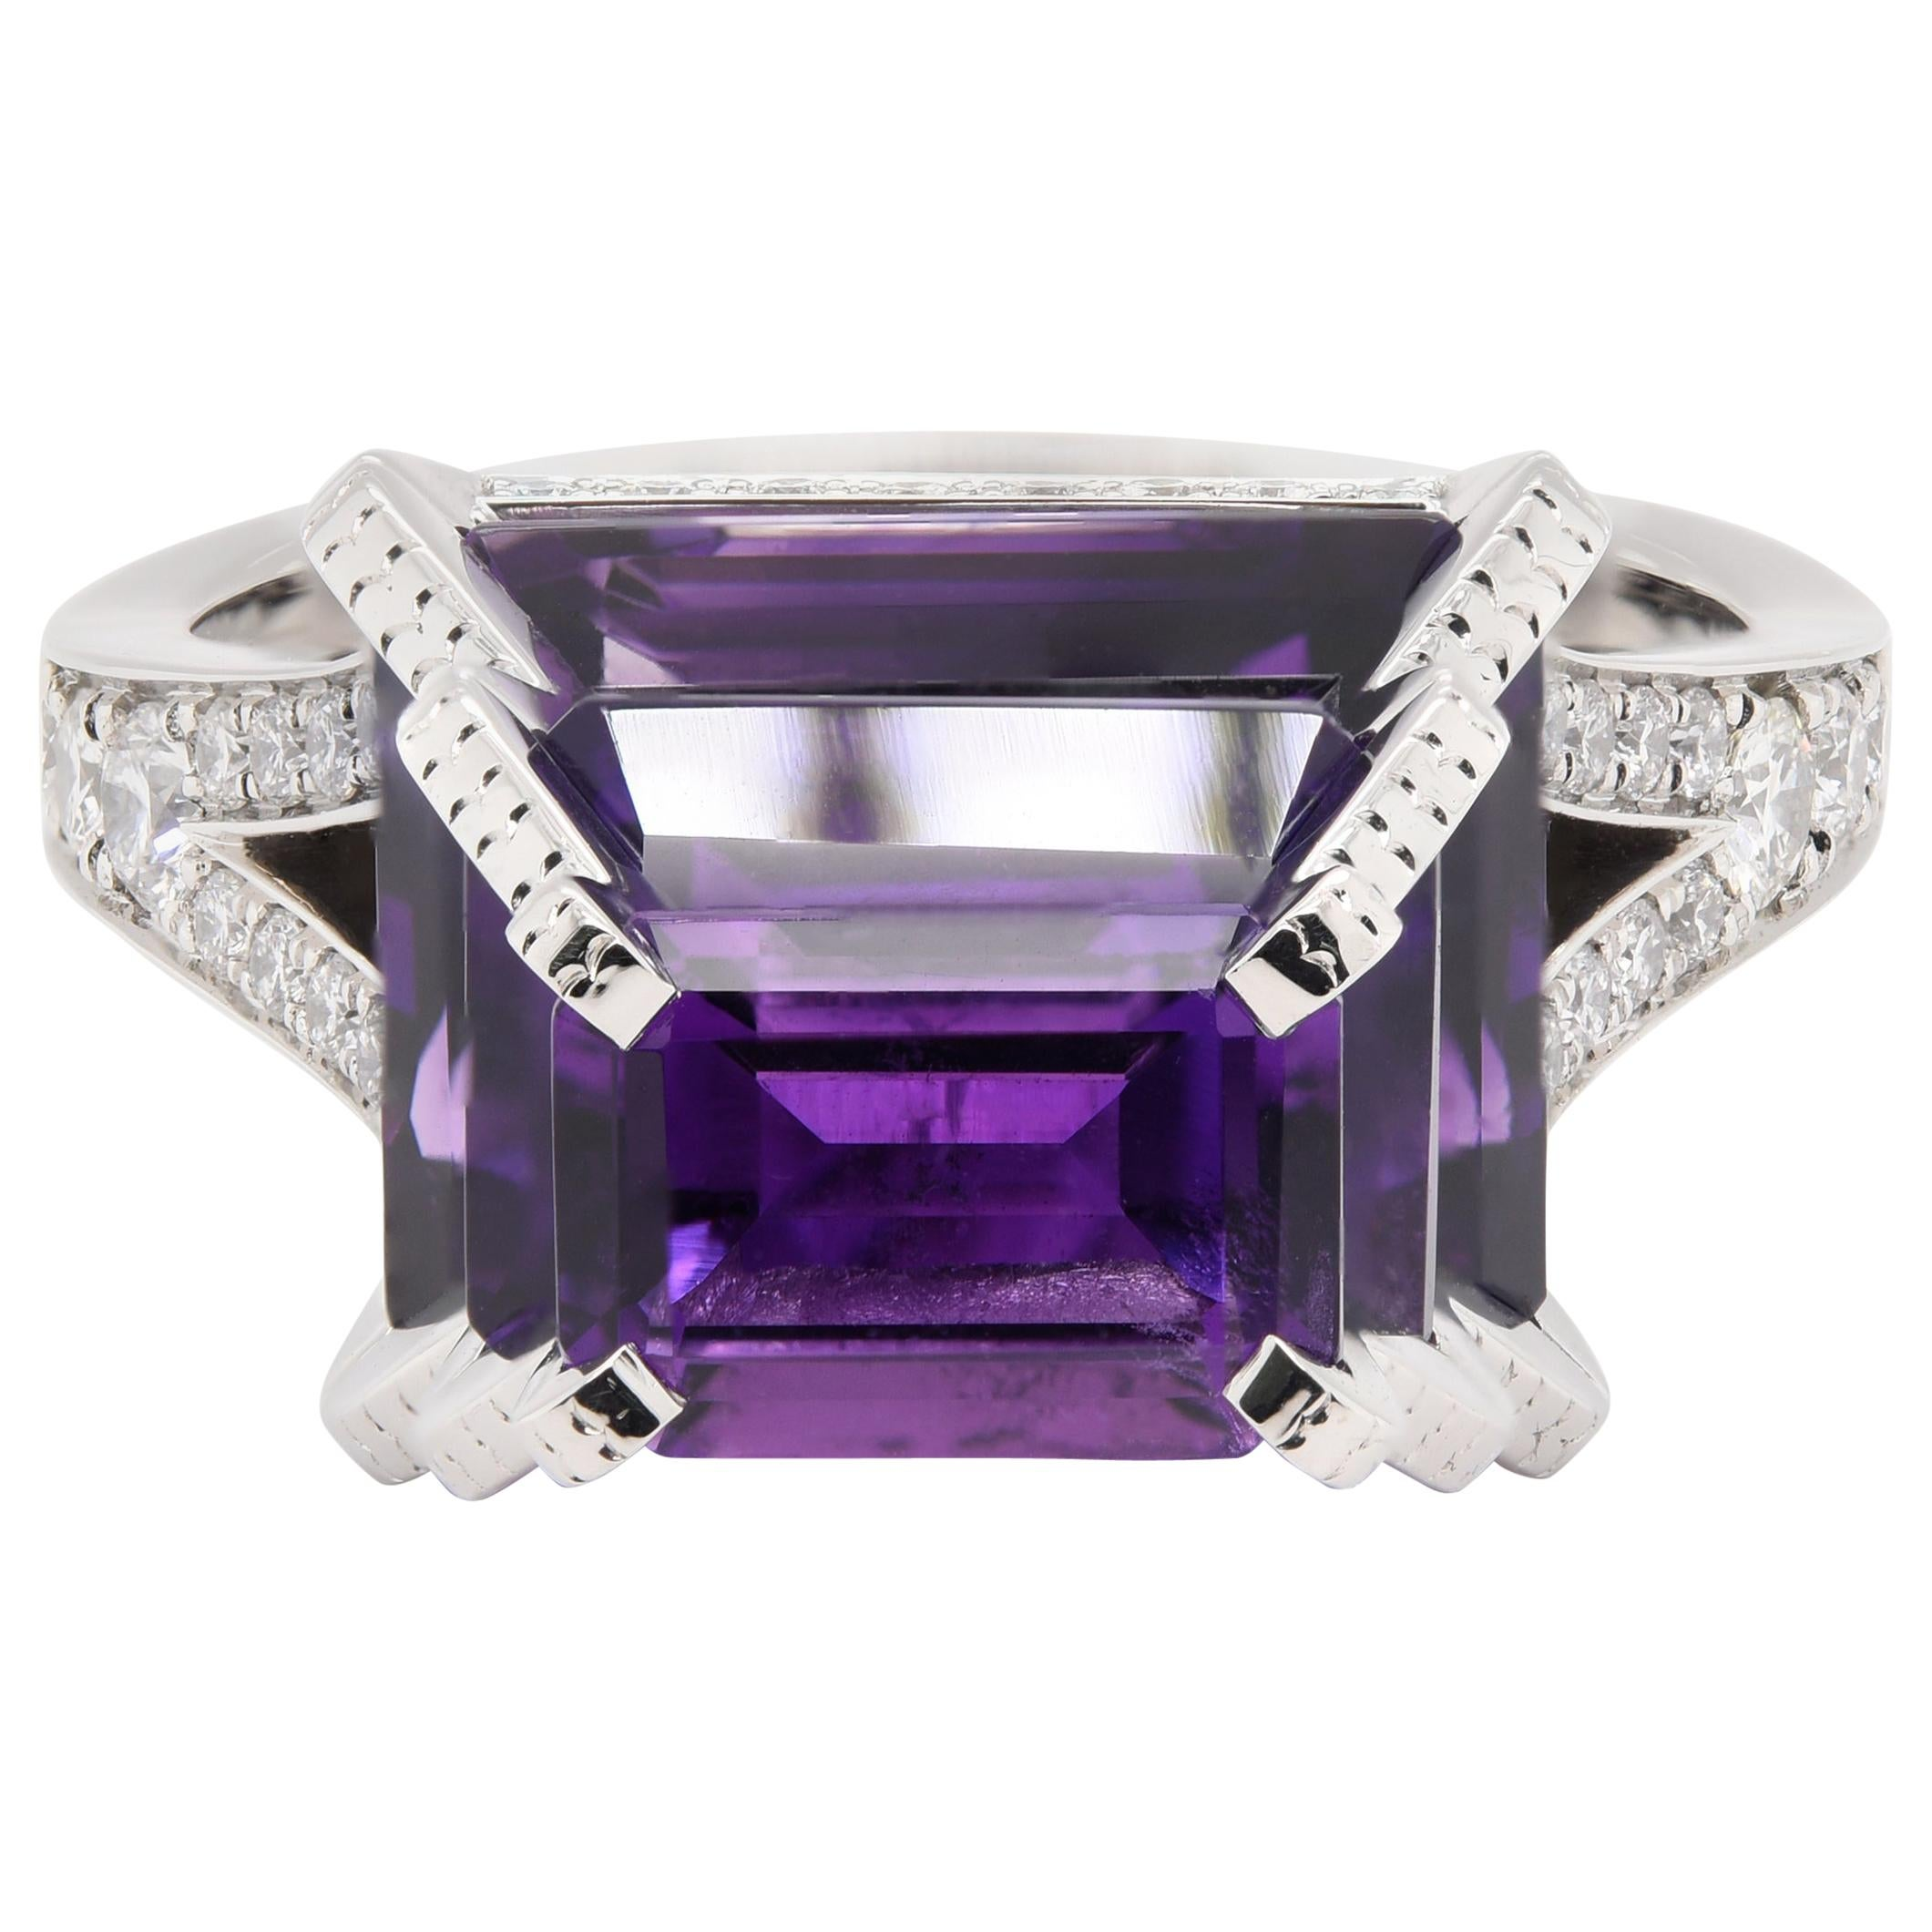 JAG New York Diamond and Amethyst Ring in Platinum